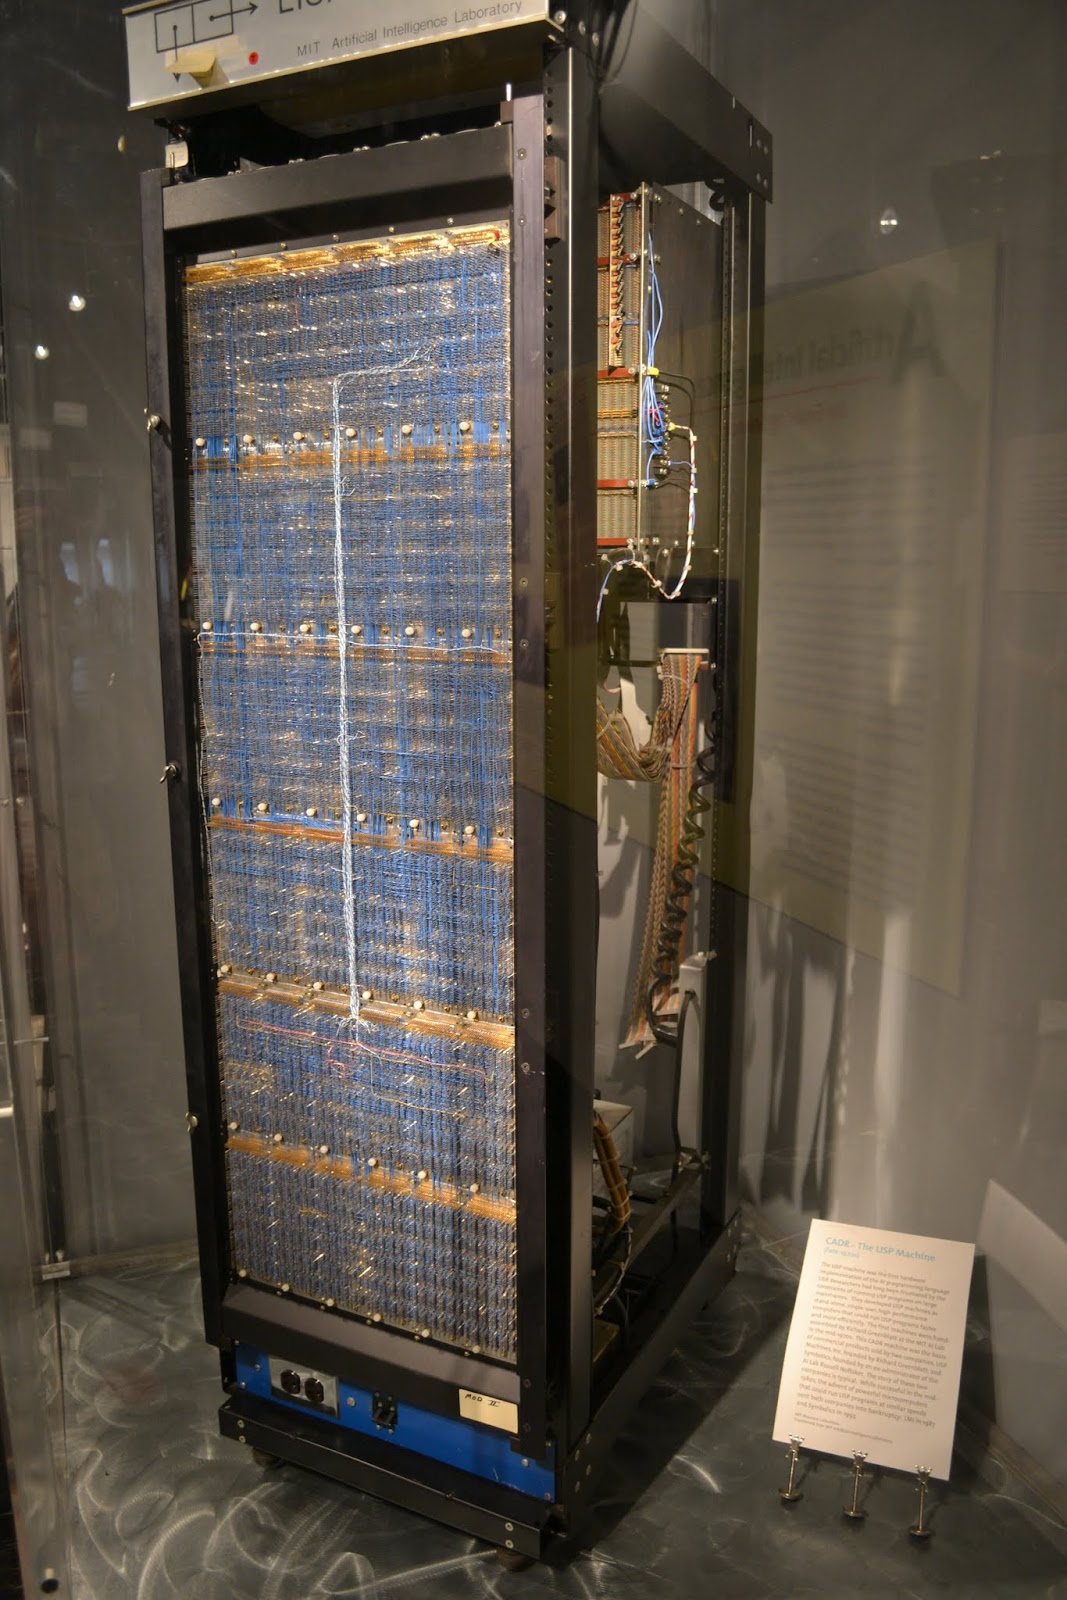 Музей Массачусетского Технологического Института, Бостон, Массачусетс(MIT museum, Boston, MA)